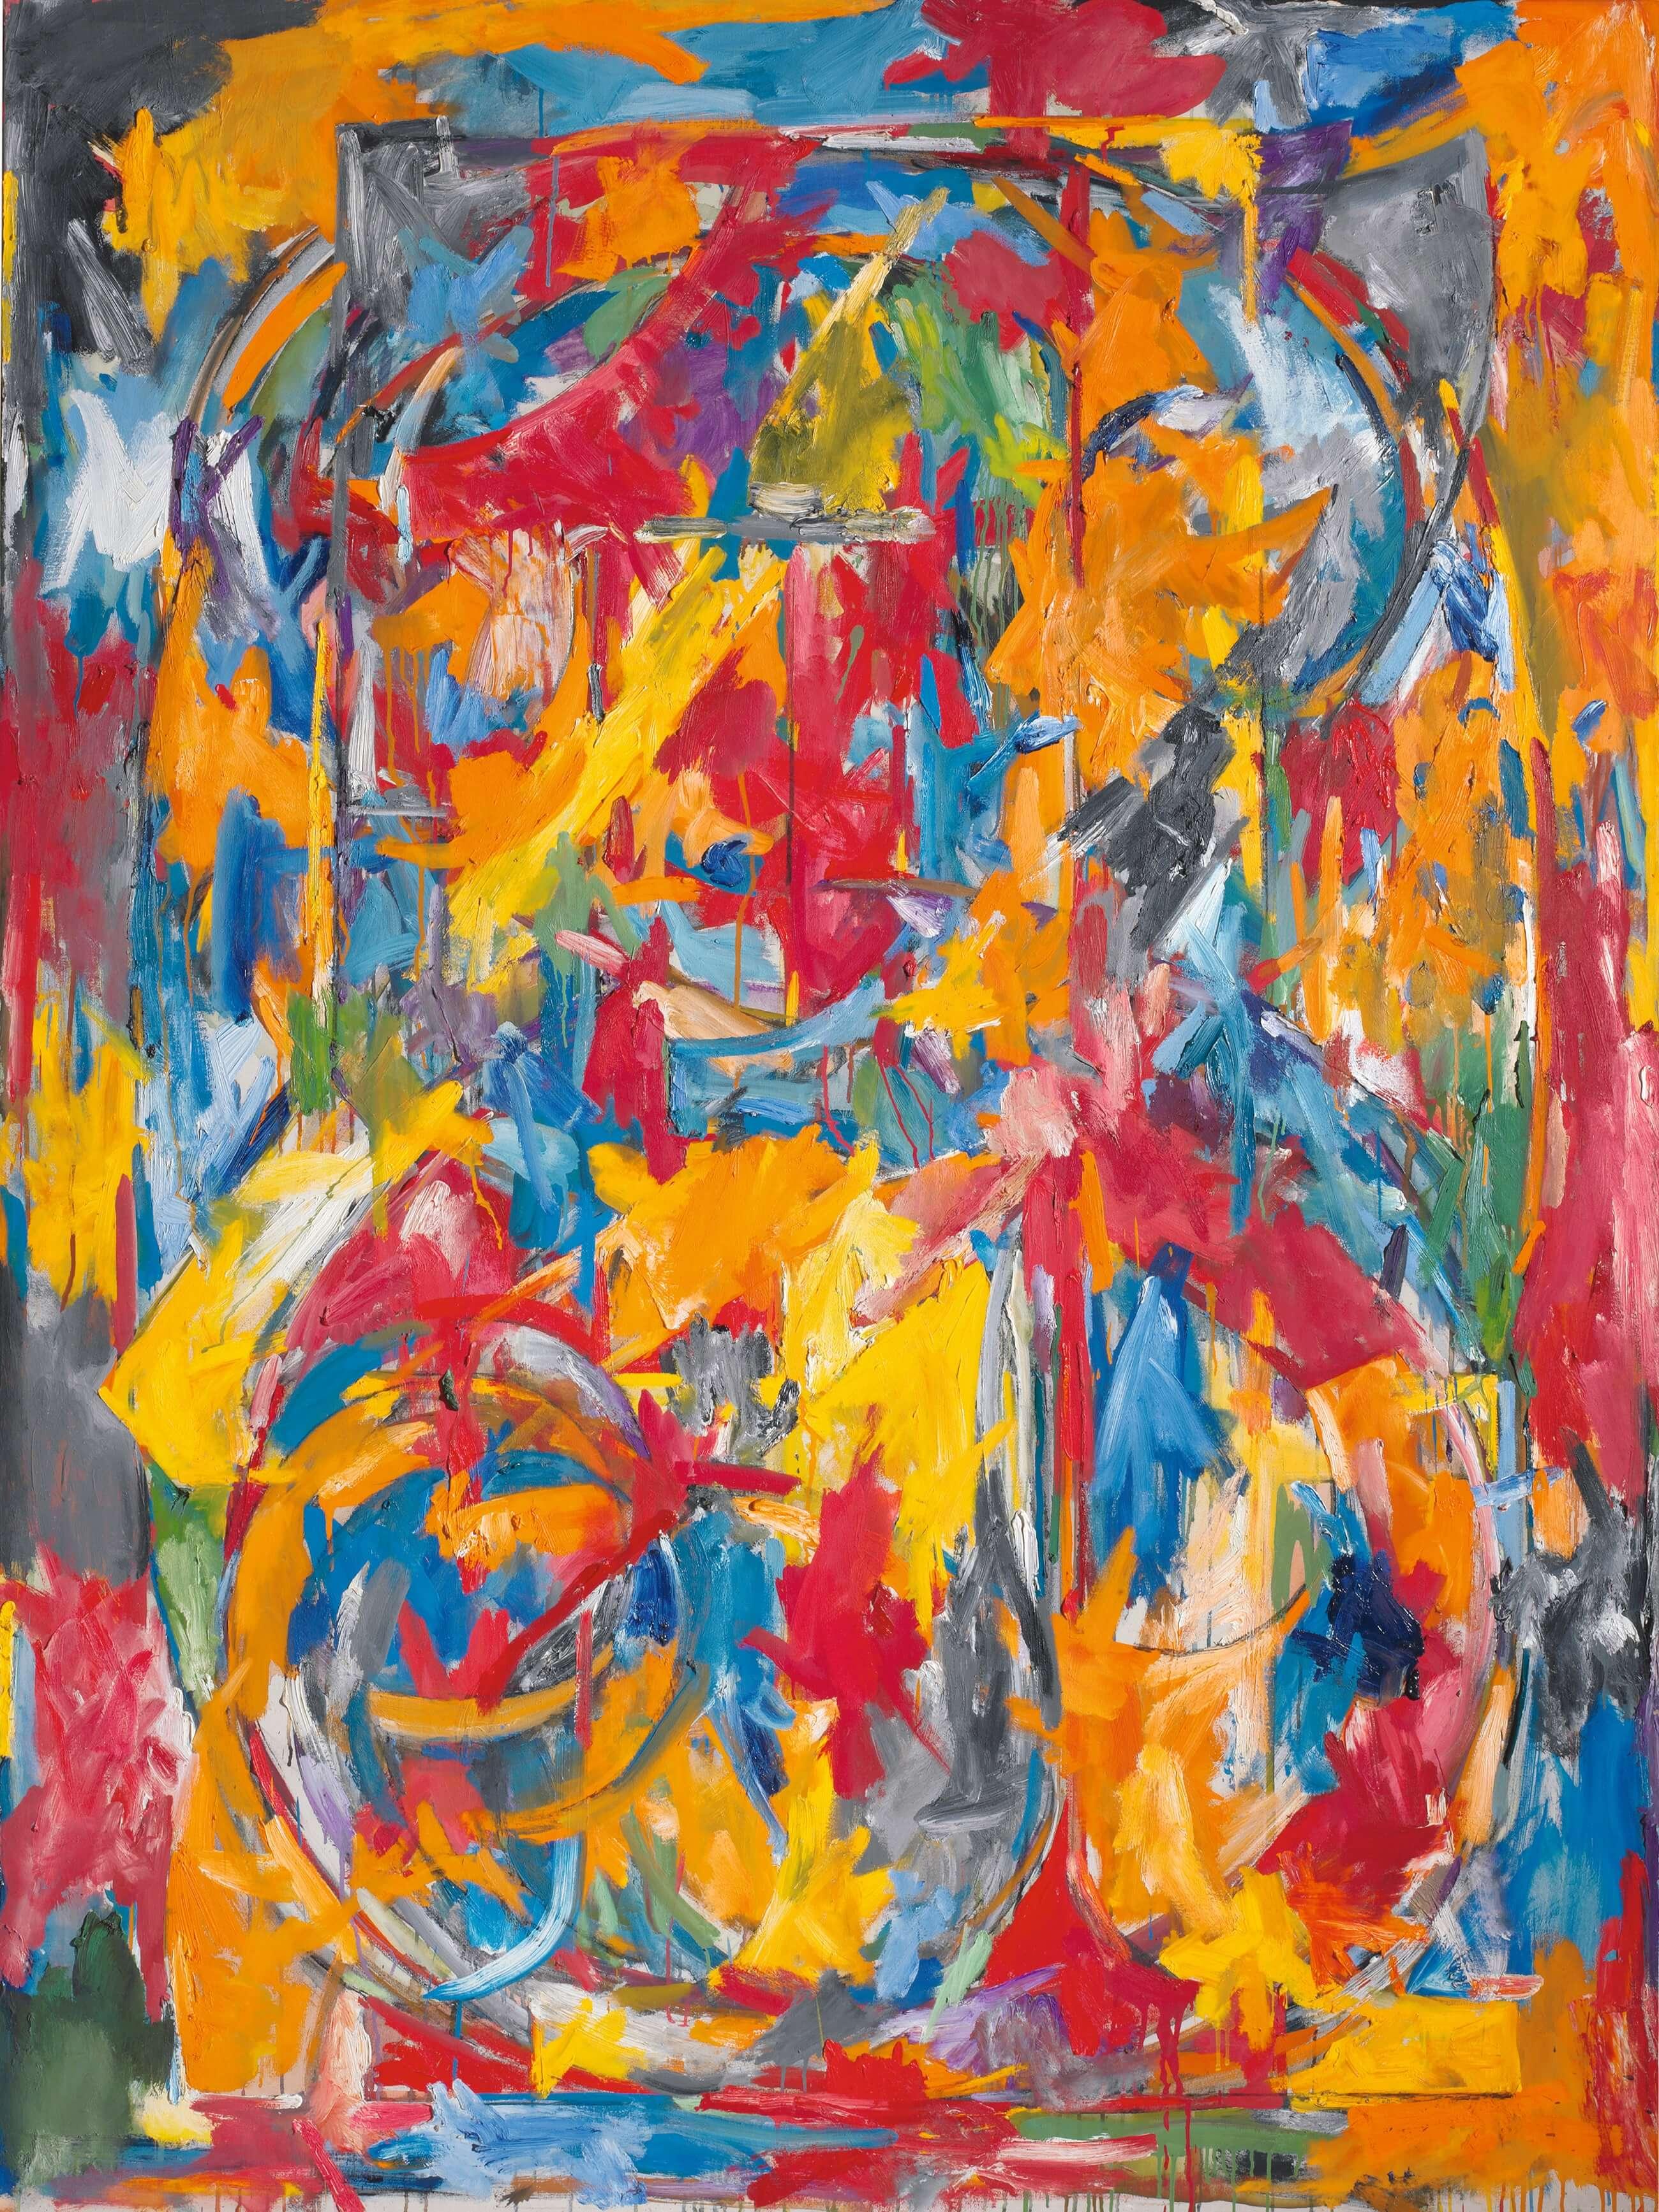 0 through 9, 1960, by Jasper Johns